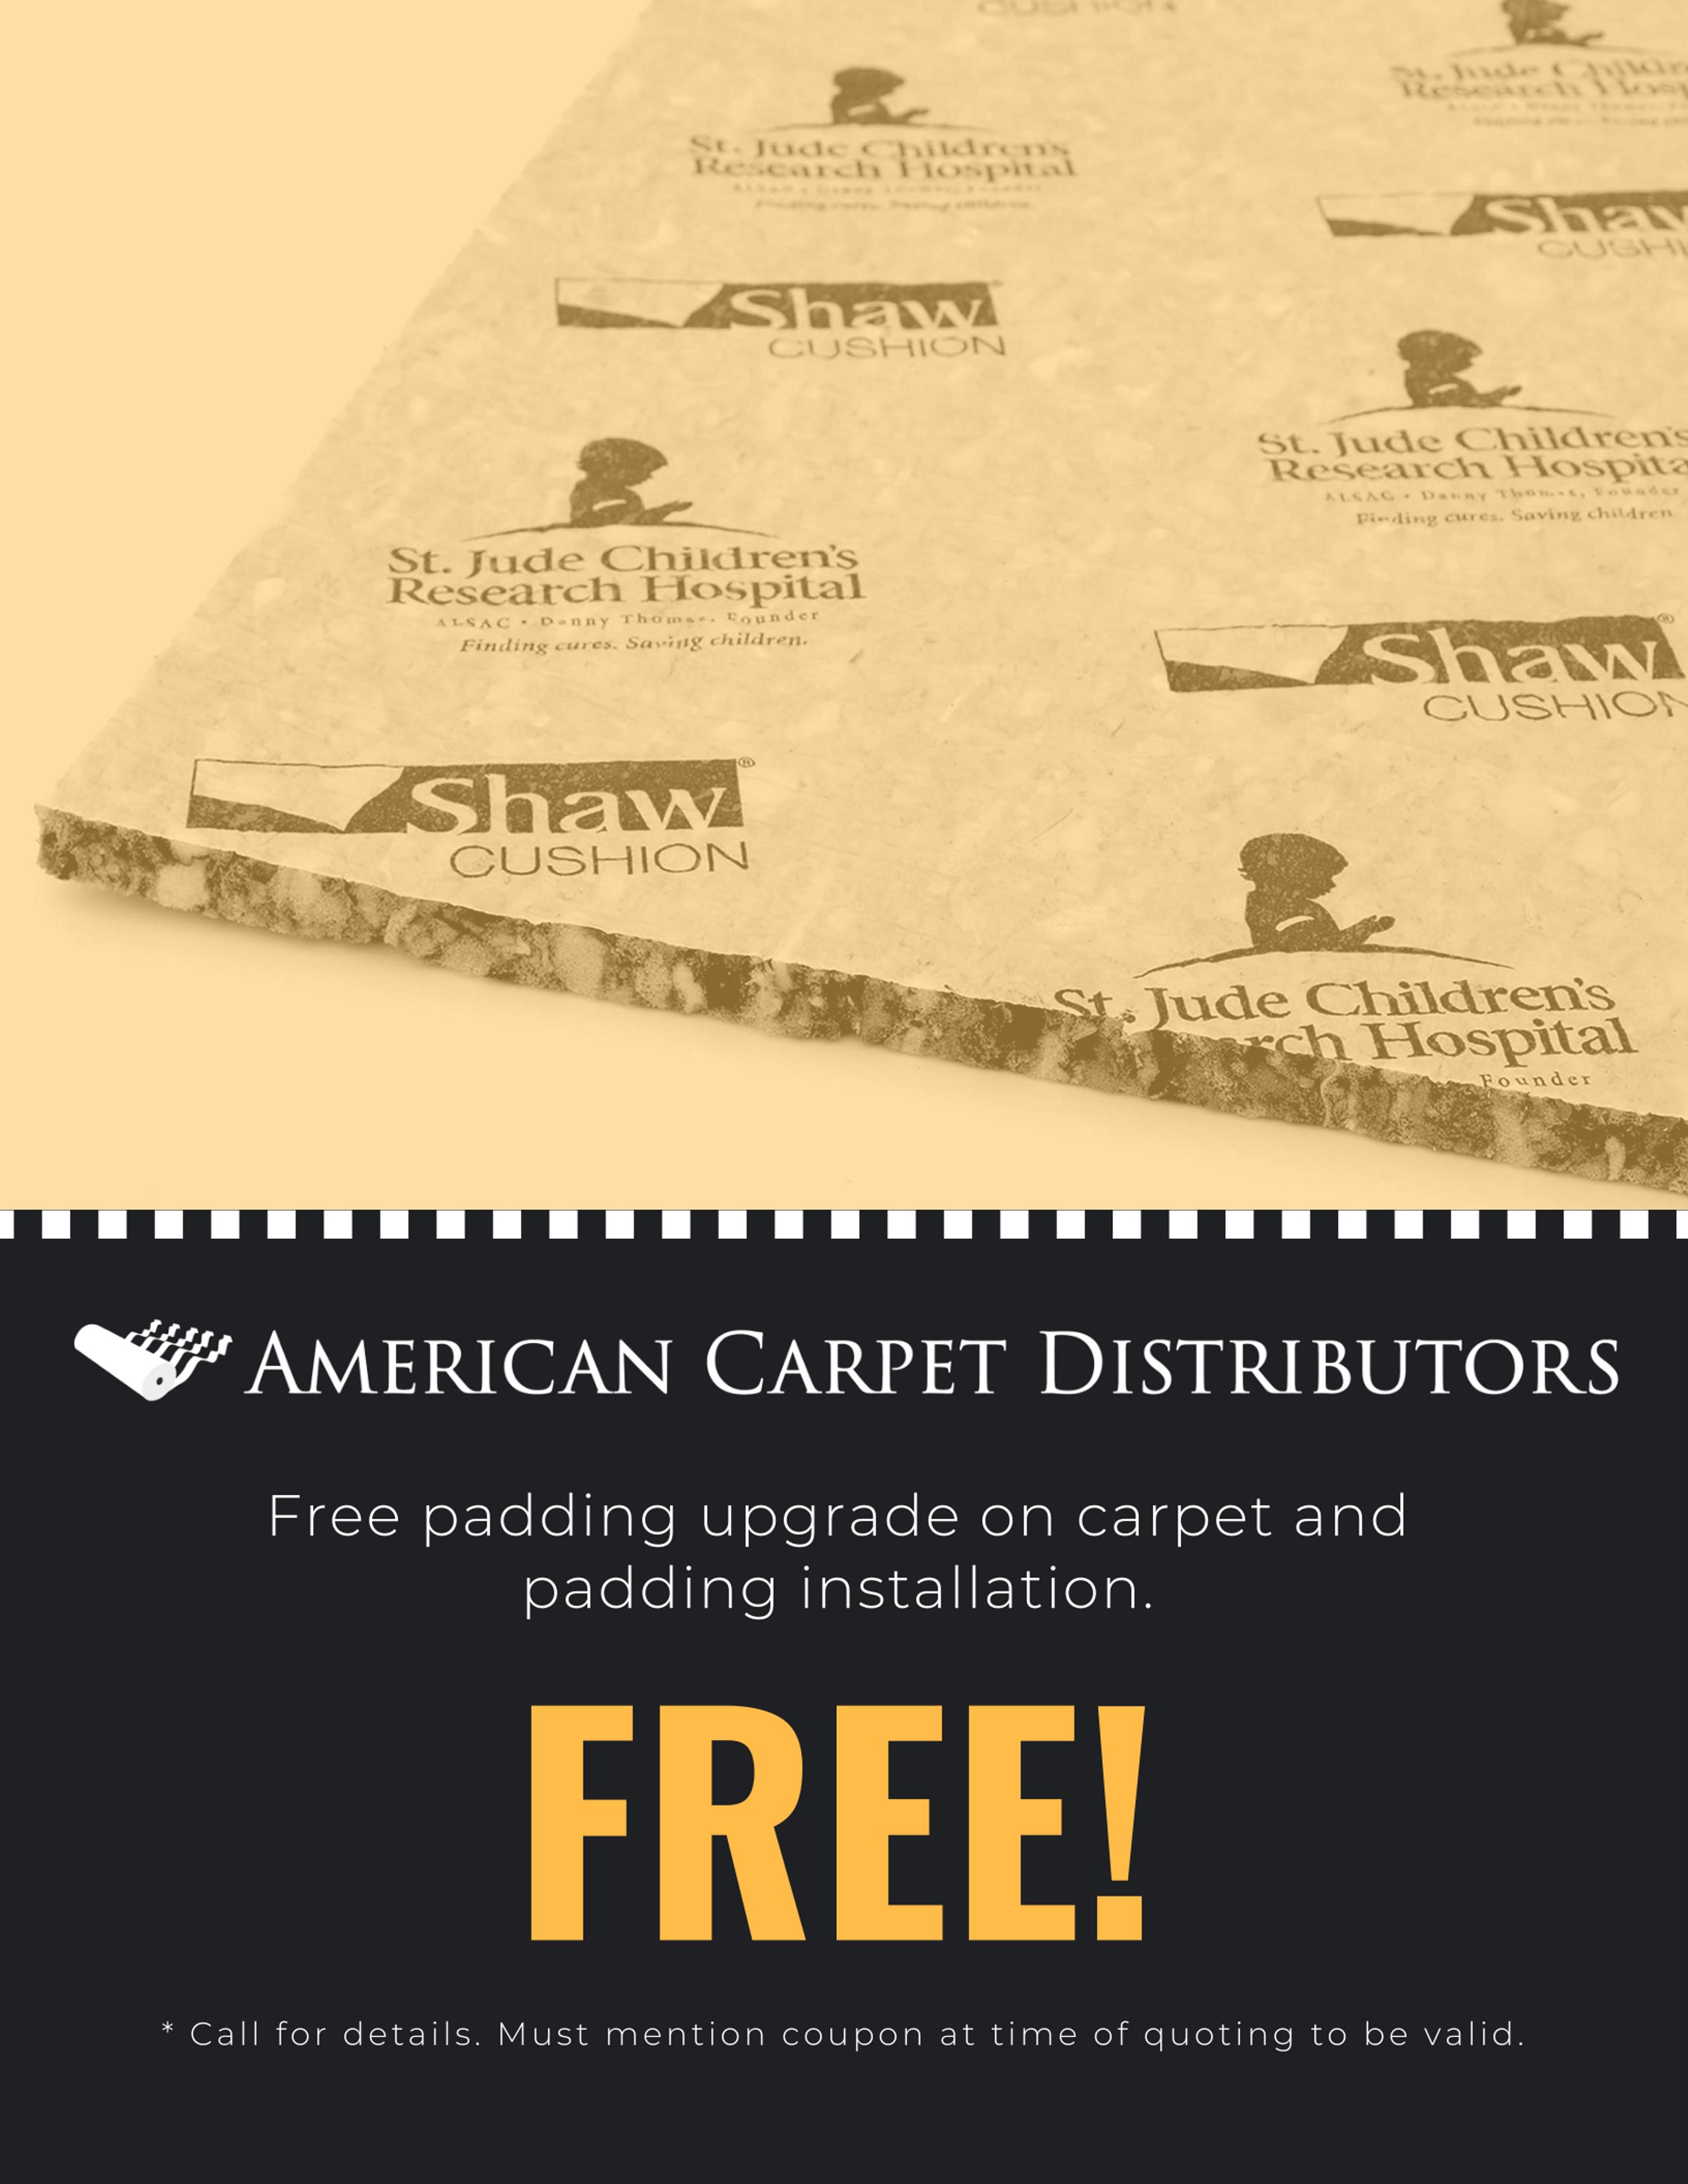 Carpet and Padding Installation Coupon